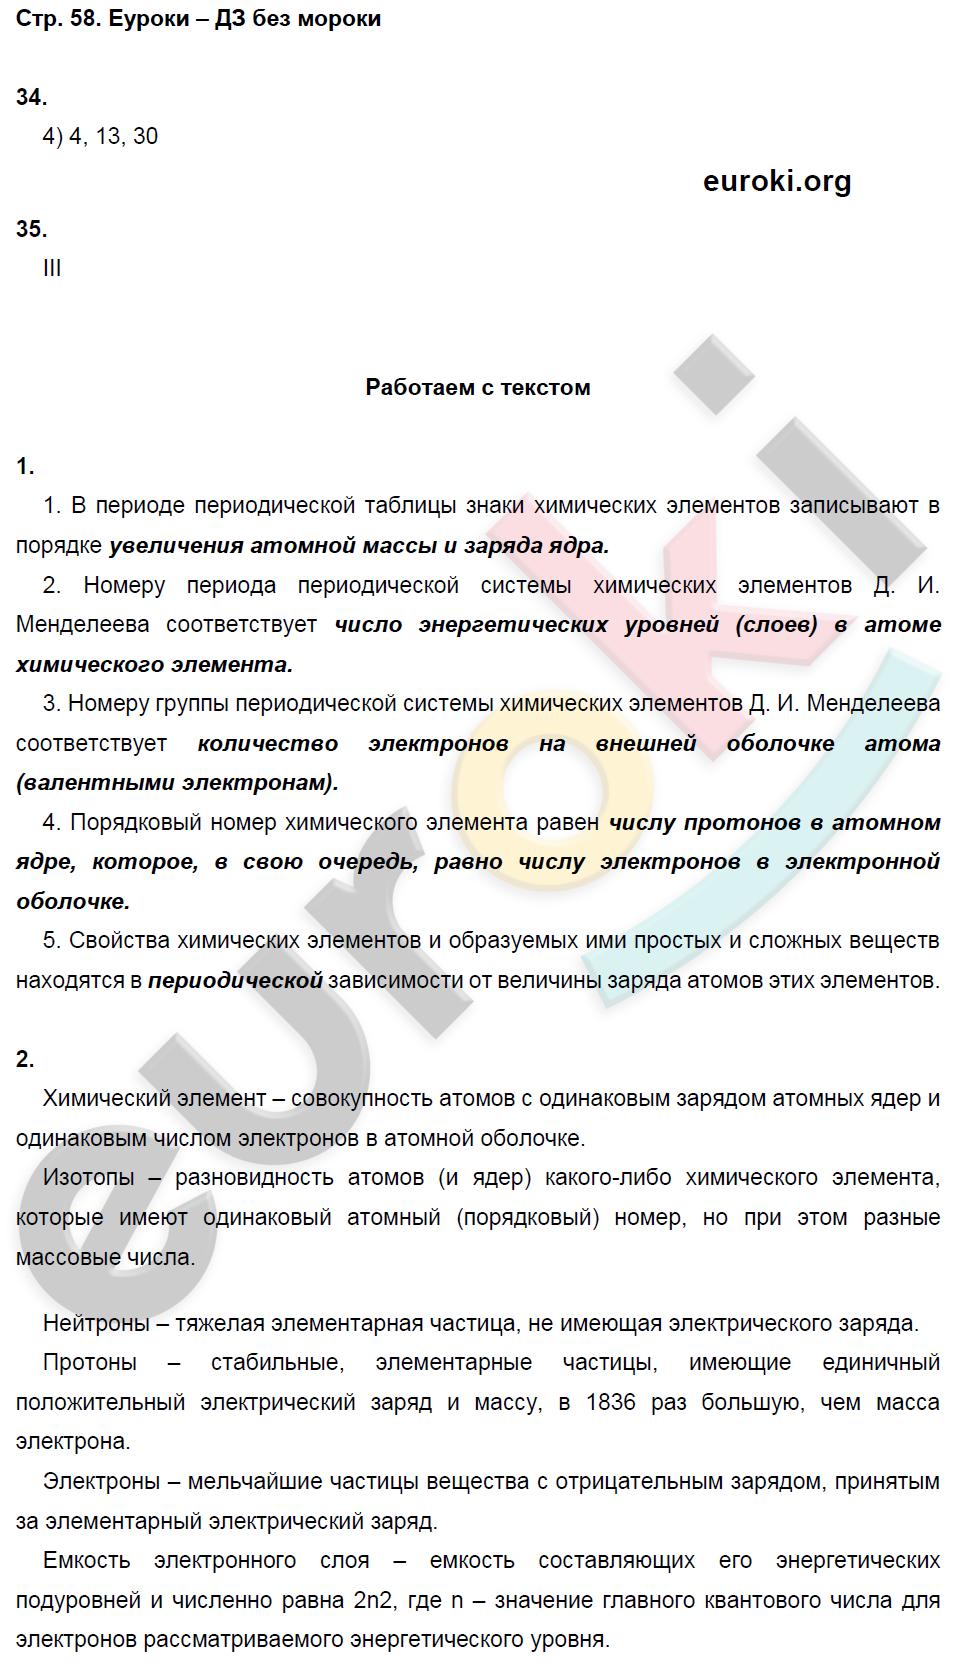 ГДЗ по химии 8 класс тетрадь тренажёр Гара. Задание: стр. 58